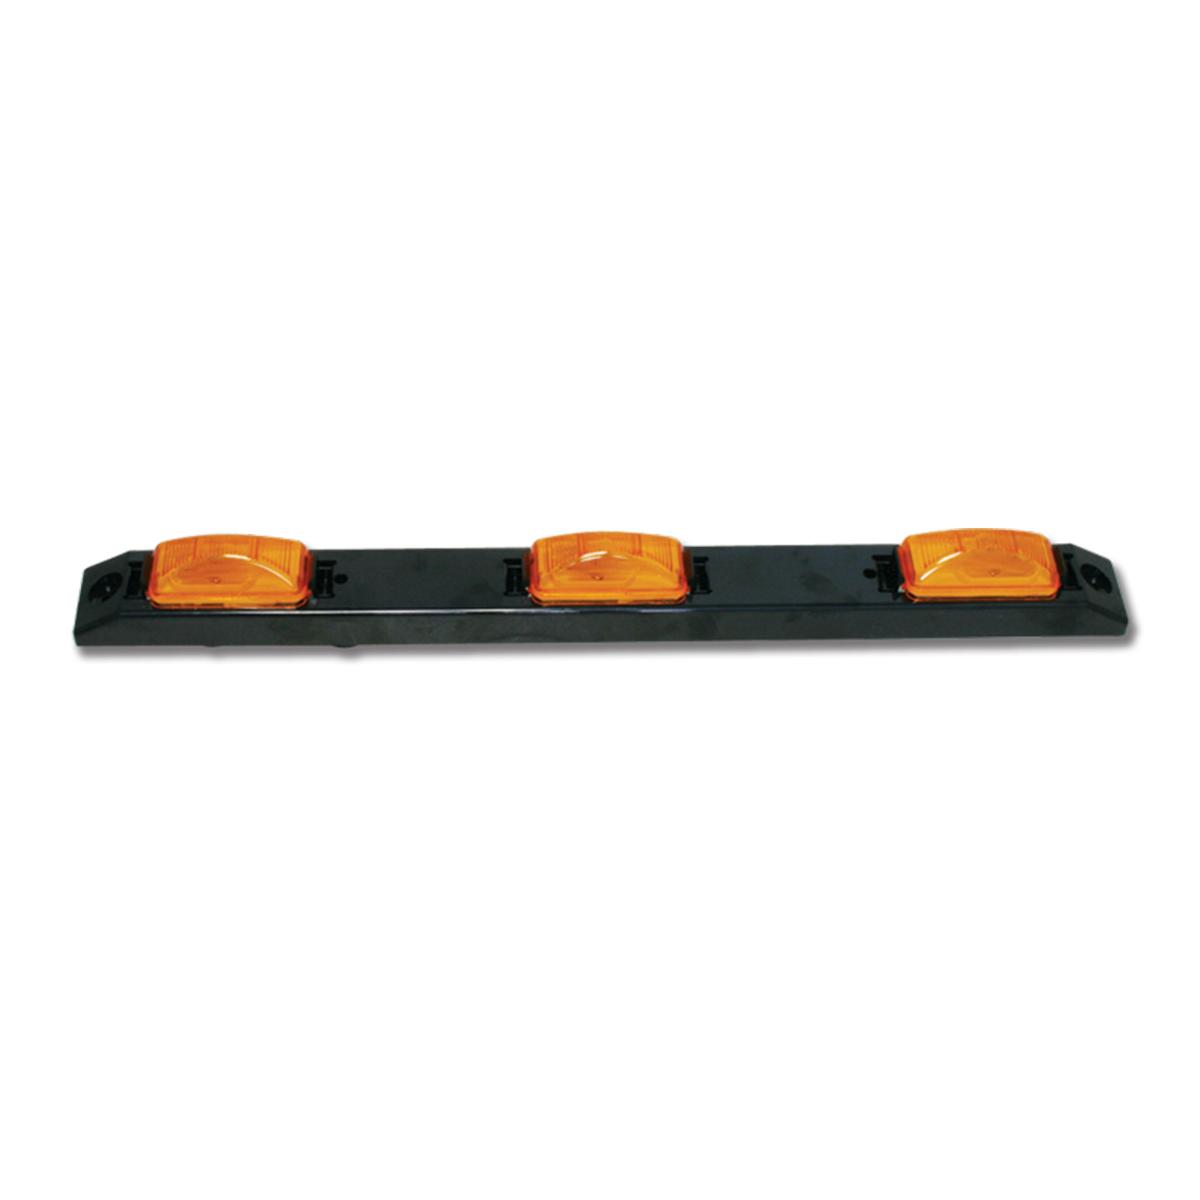 87092 ID Bar with LED Lights